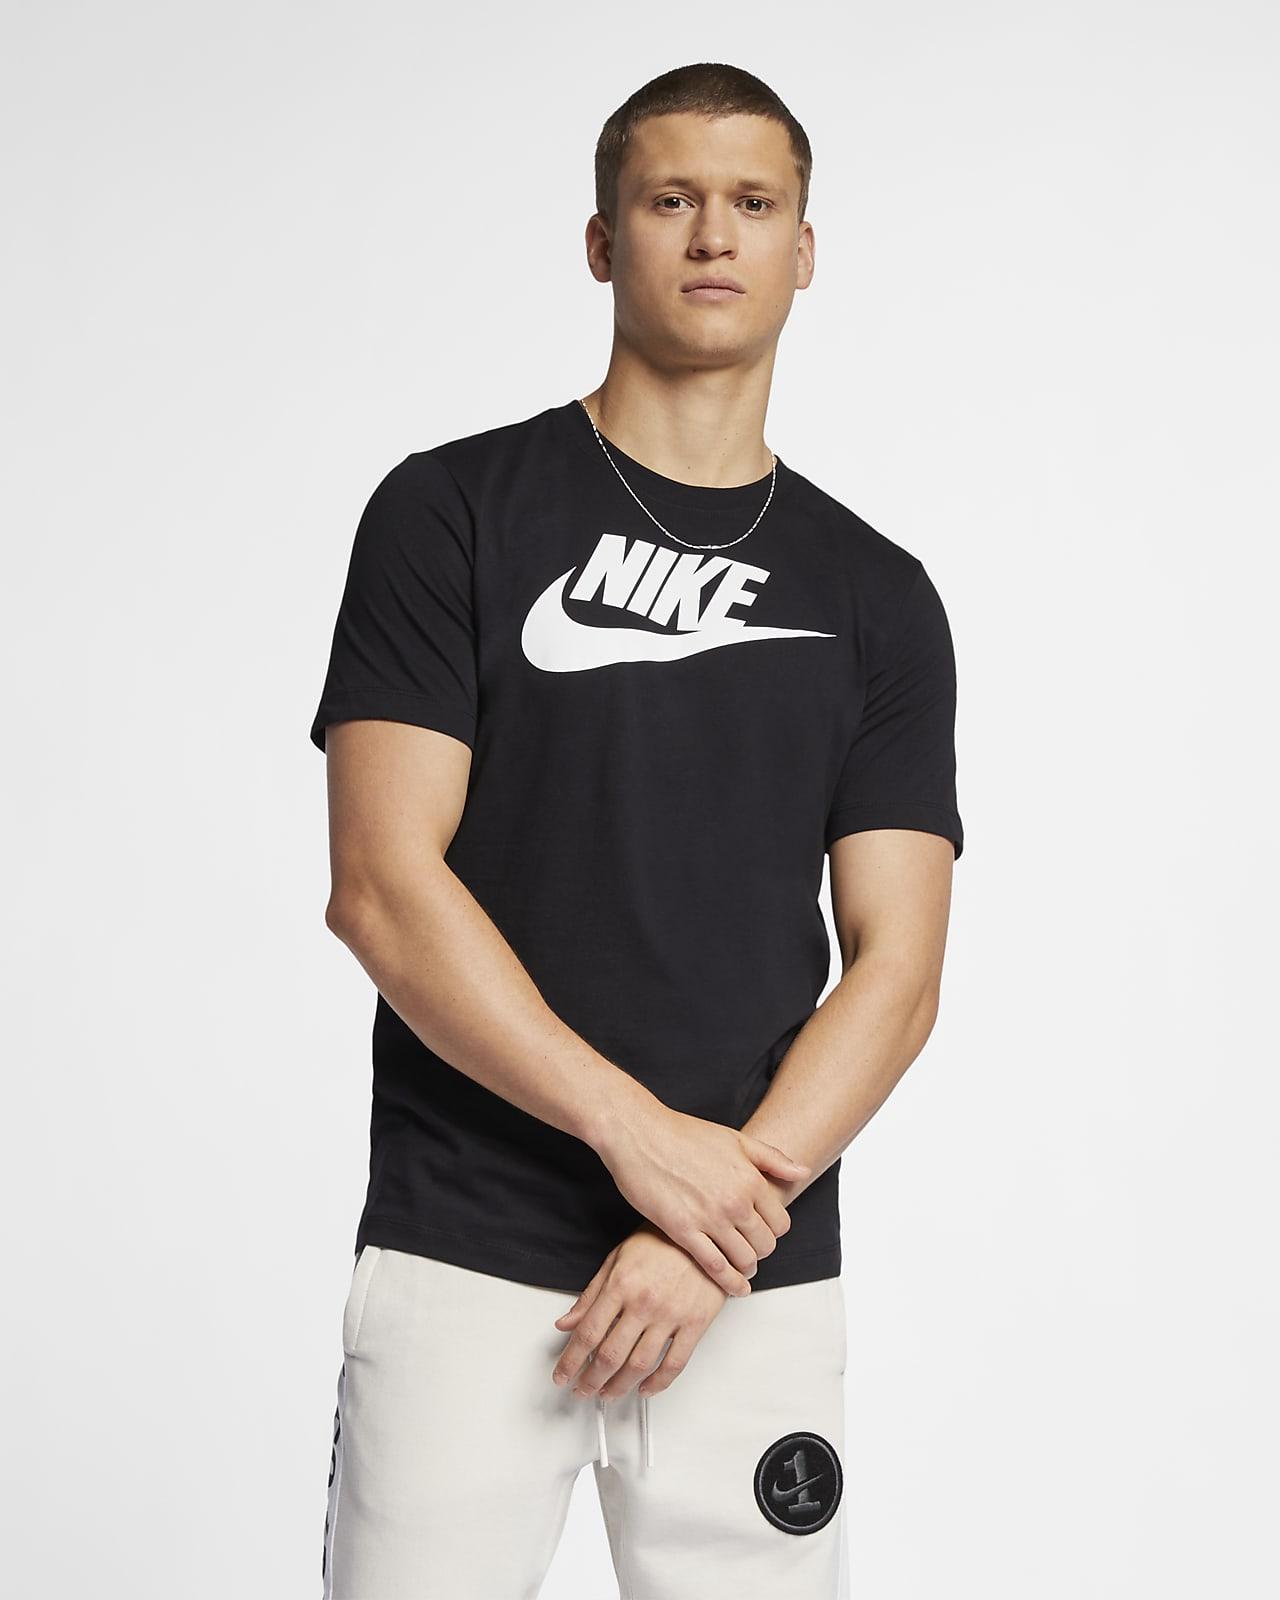 Nike Sportswear Herren-T-Shirt